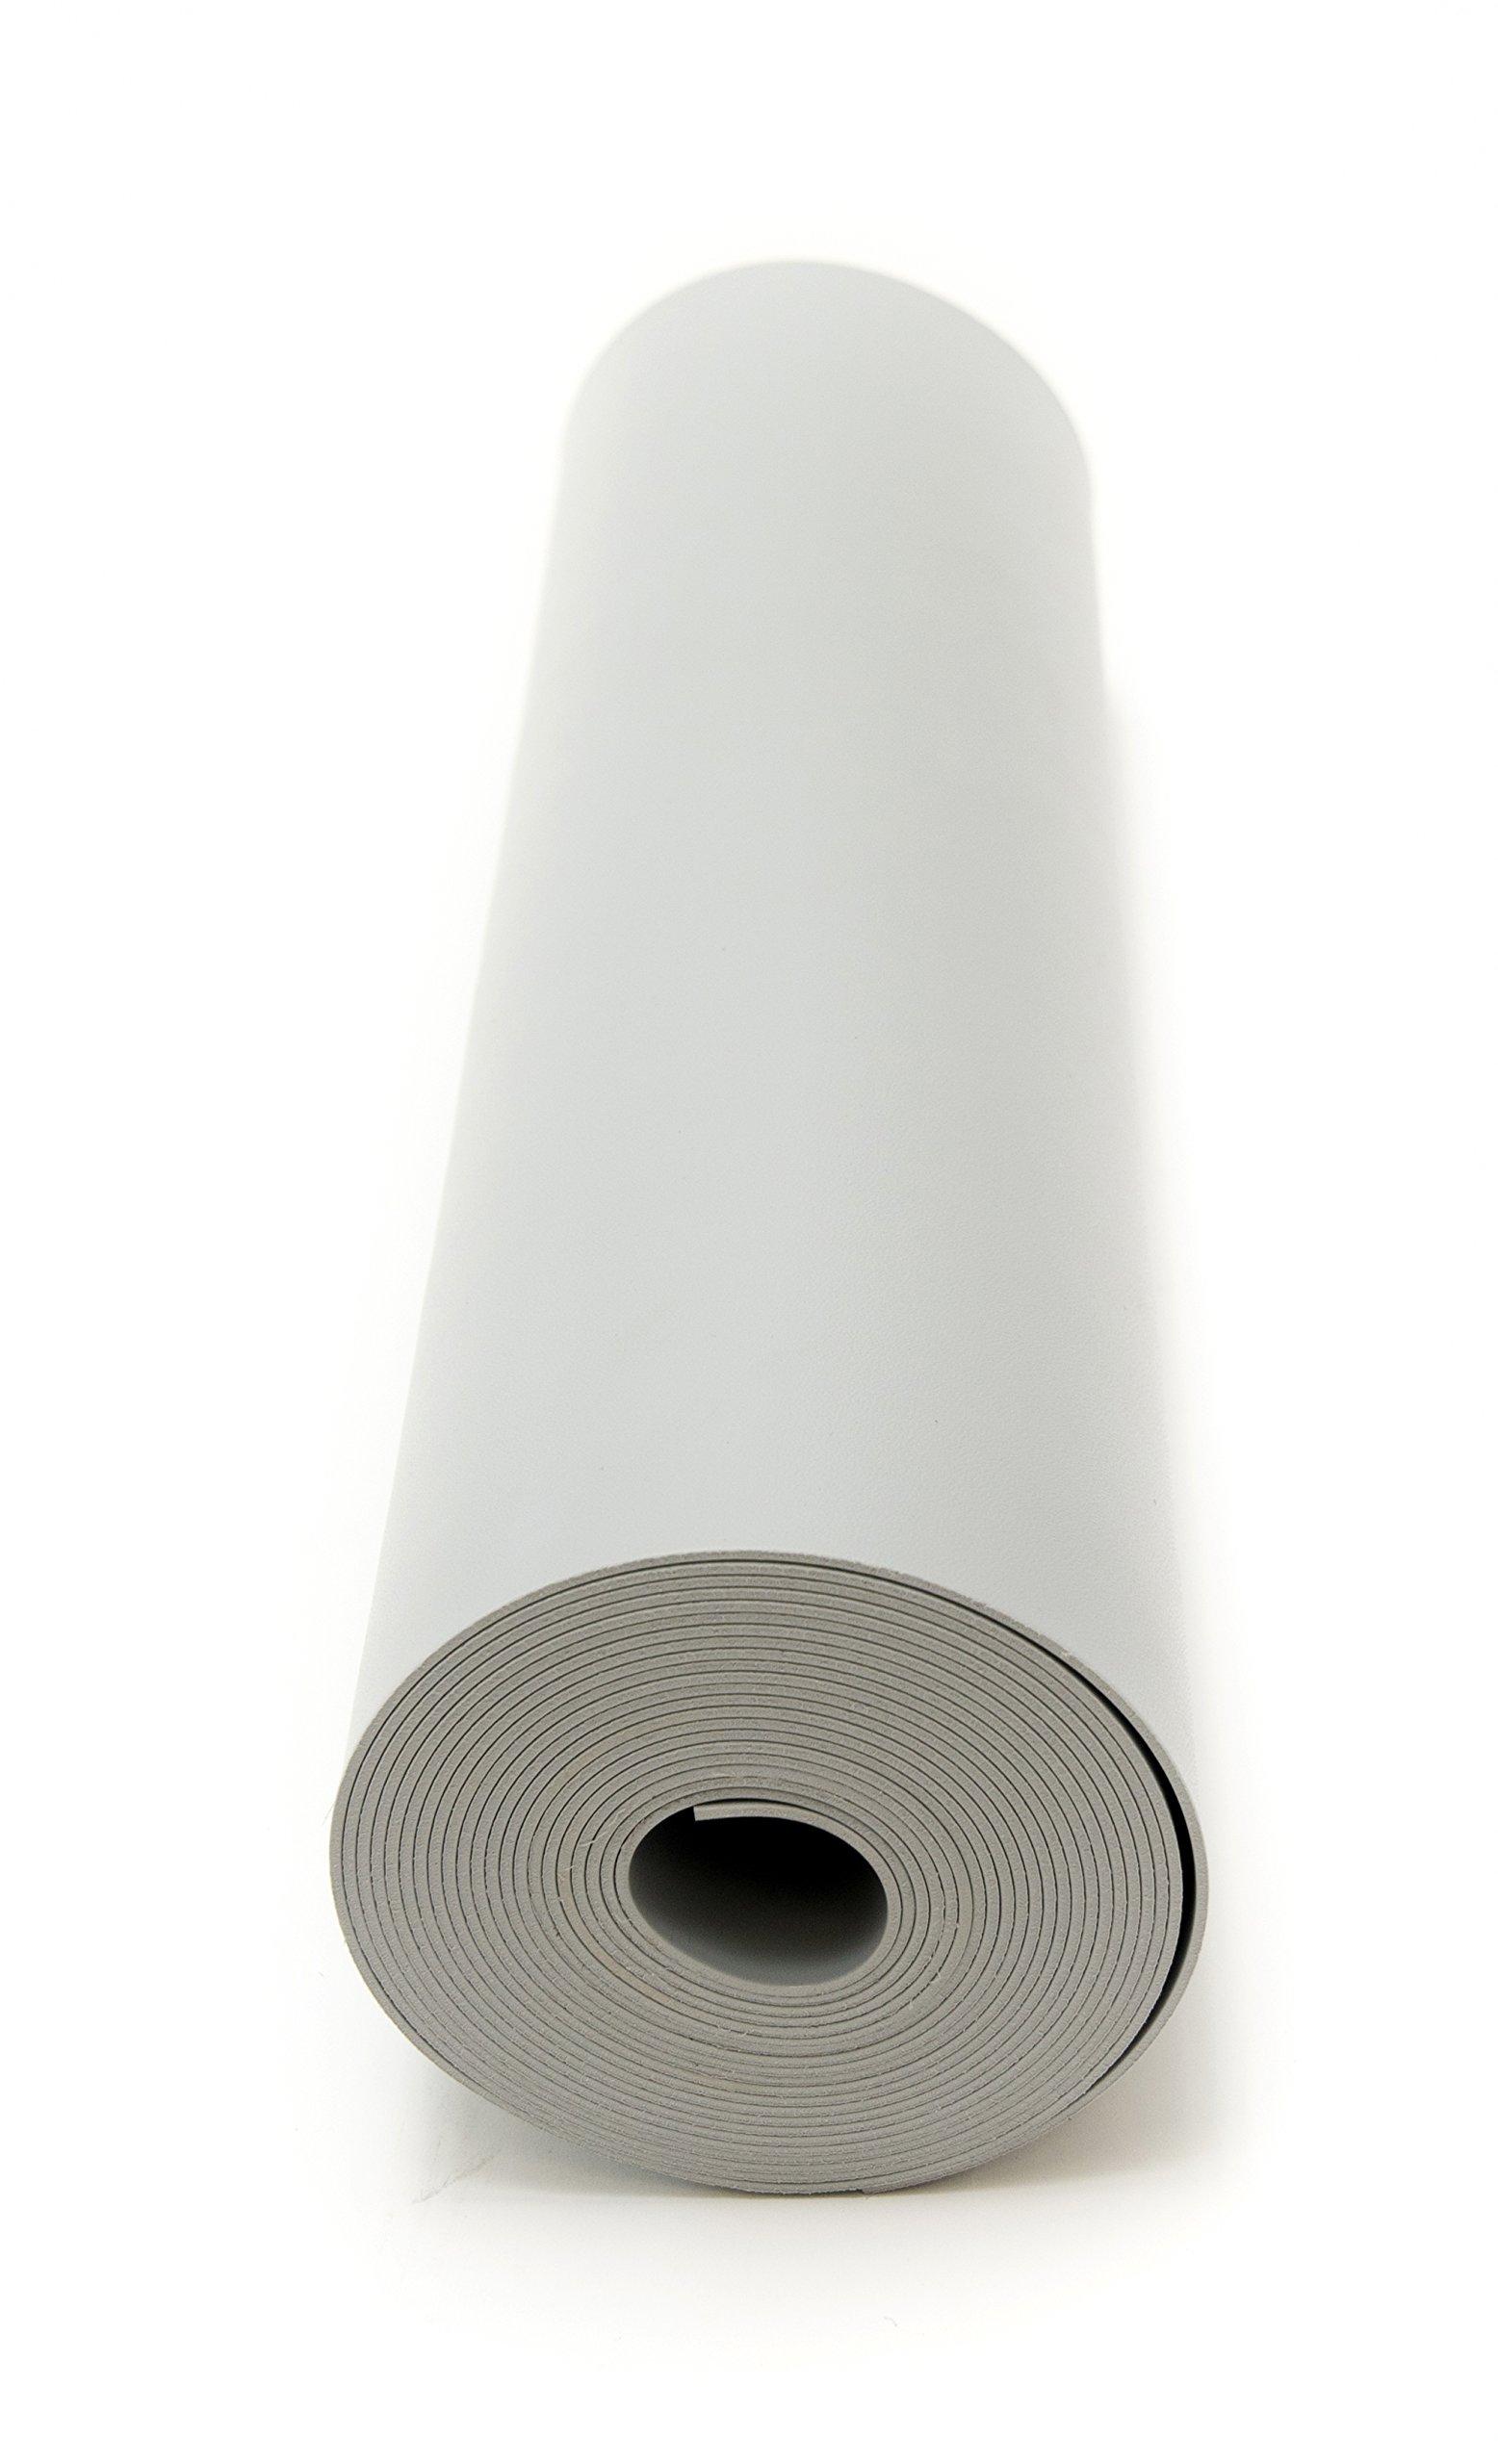 Bertech ESD Mat Roll, 2' Wide x 20' Long x 0.093'' Thick, Gray (Made in USA) by Bertech (Image #3)